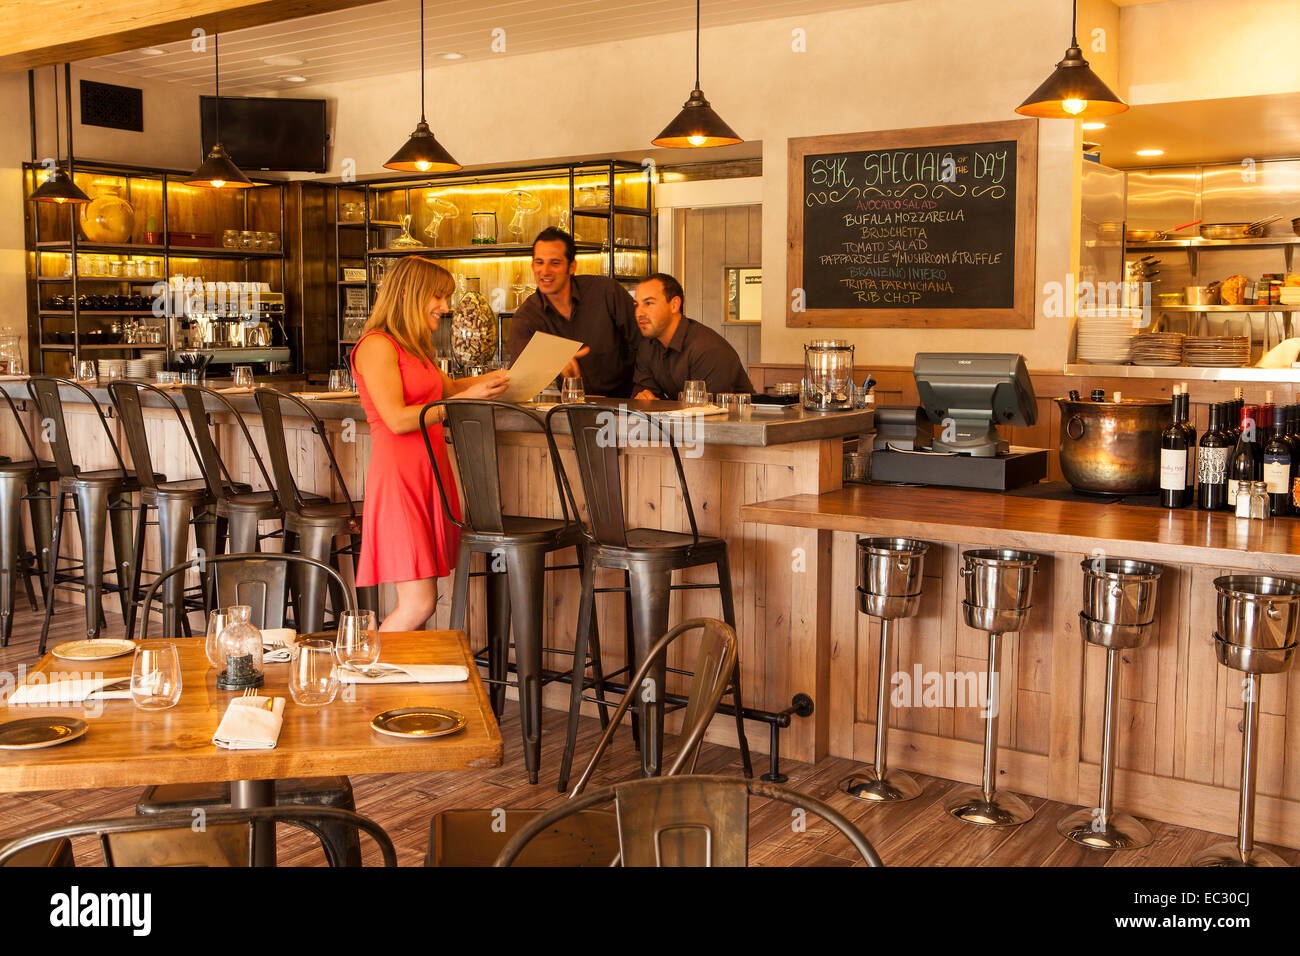 Ordinaire Bar Of S. Y. Kitchen, Santa Ynez, Santa Ynez Valley, California, United  States Of America